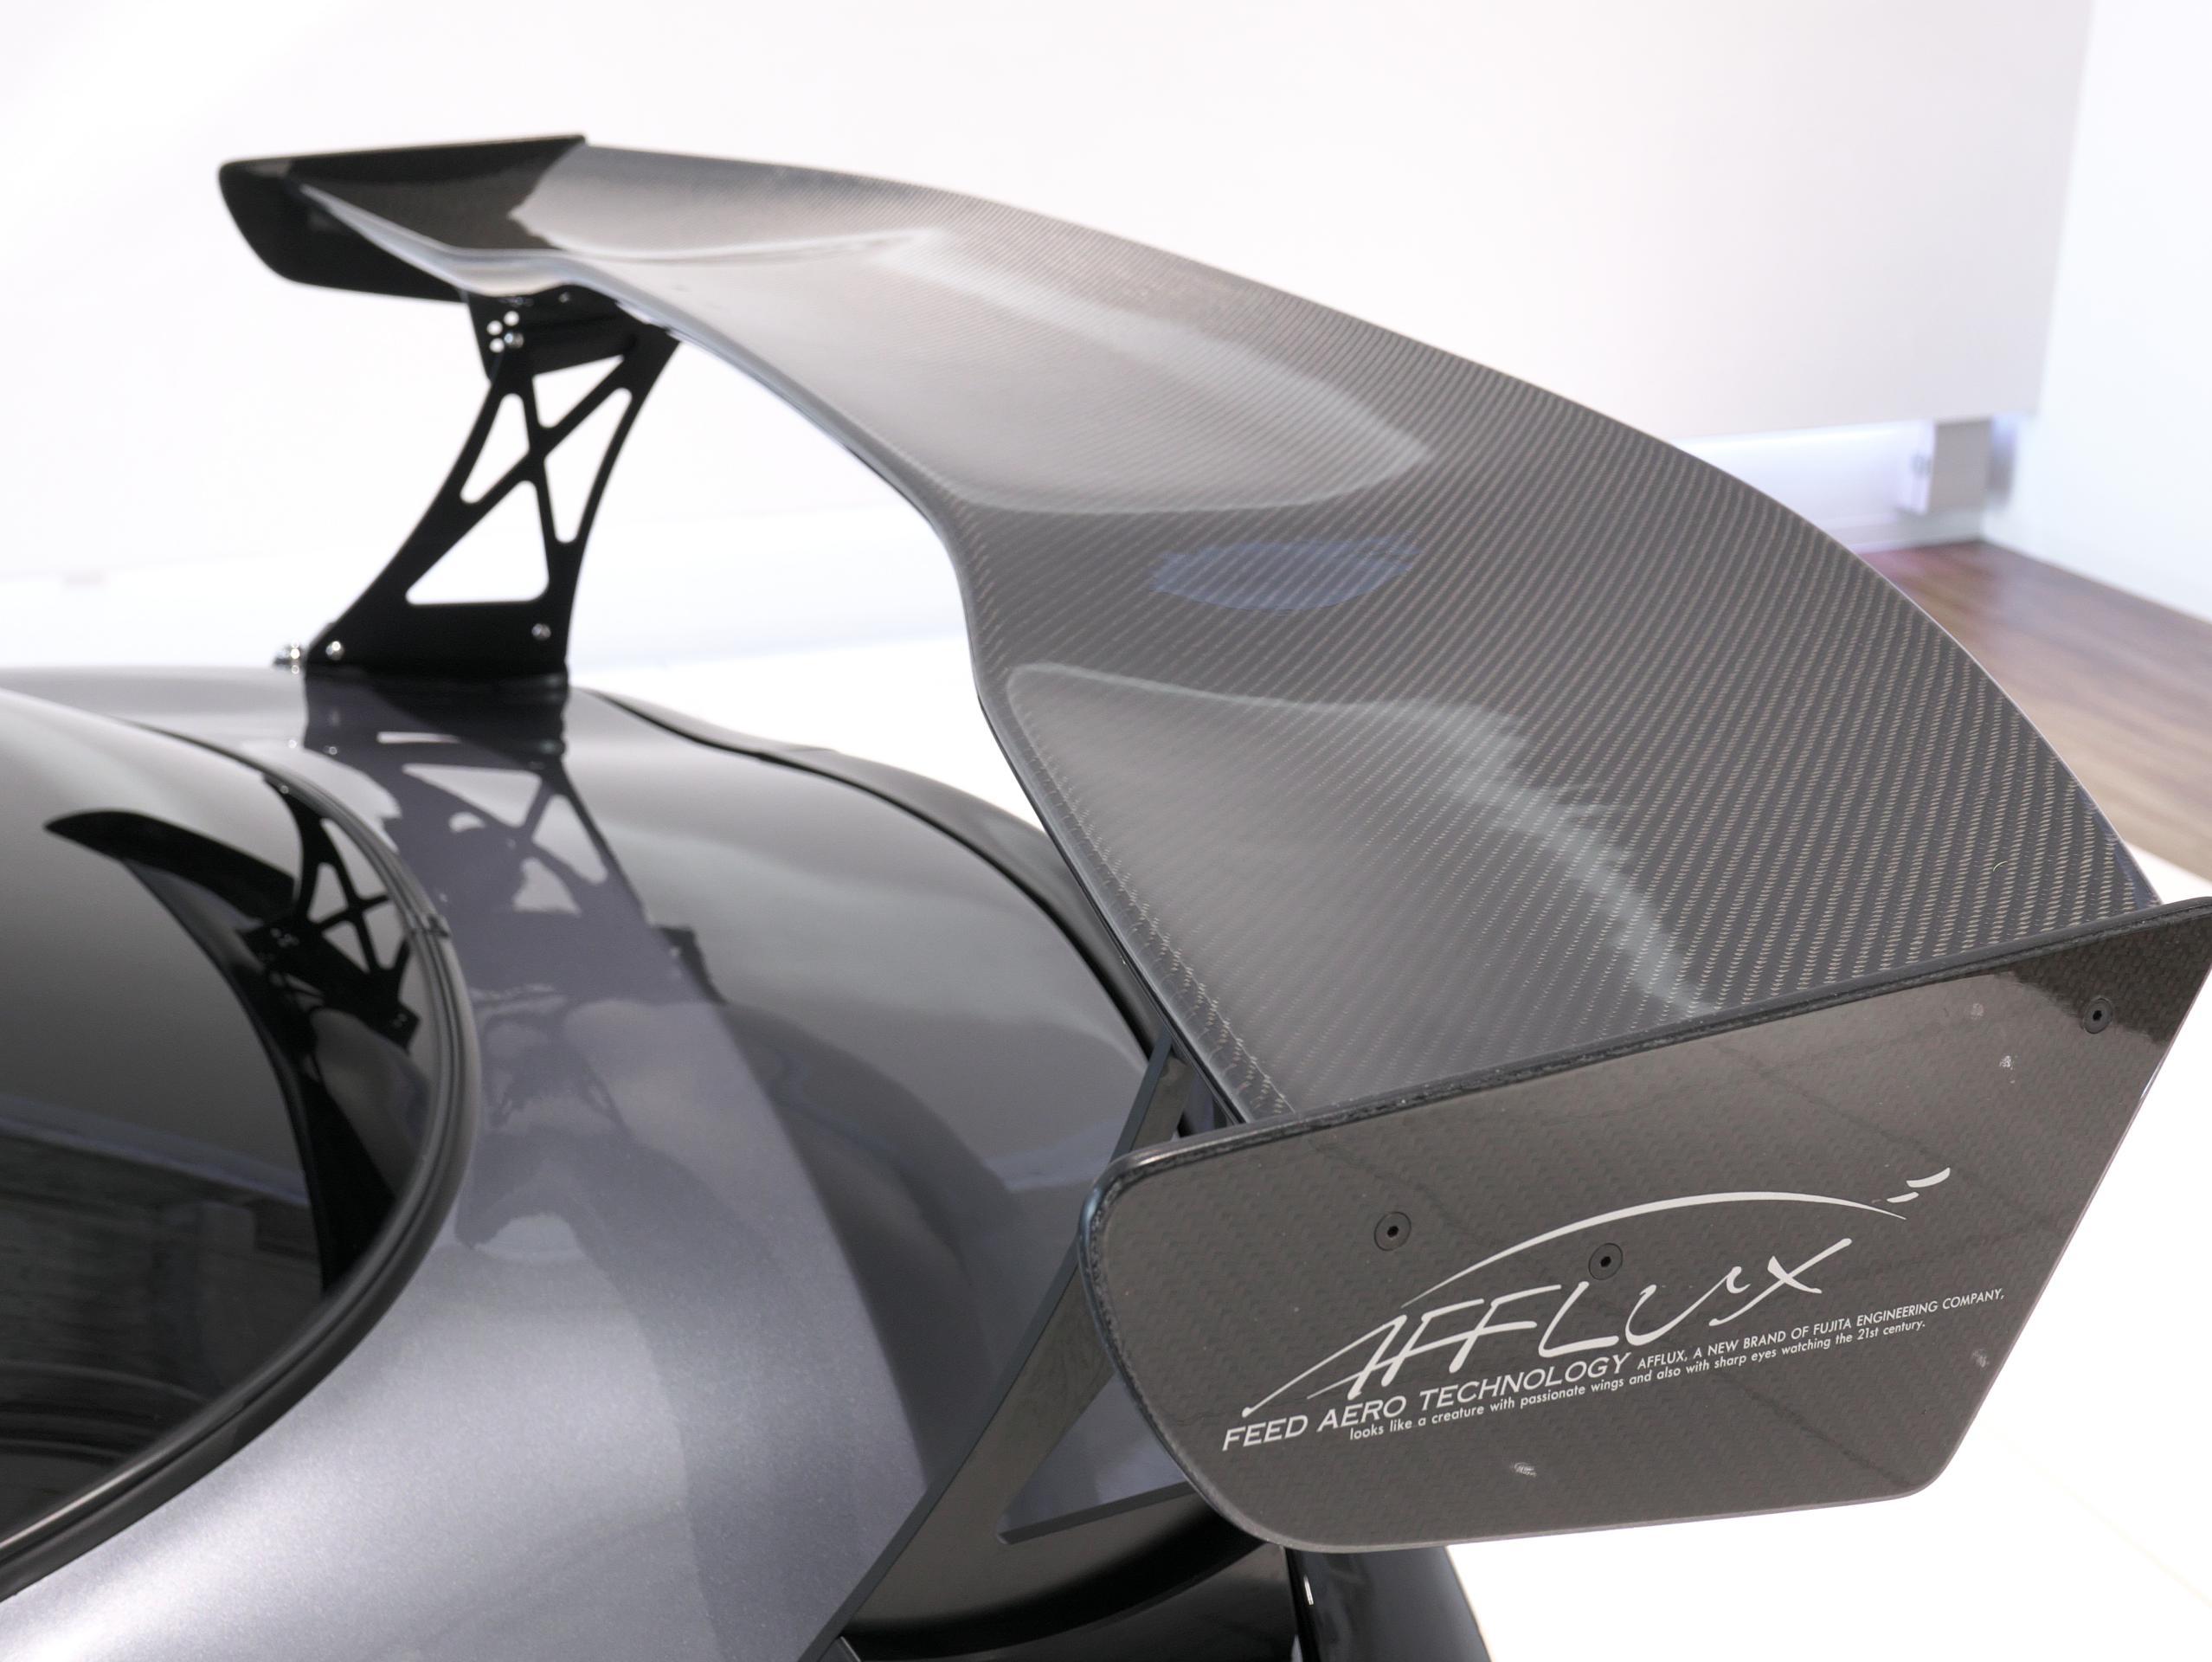 RX-7 スピリットR タイプA 魔王 リアスポイラー